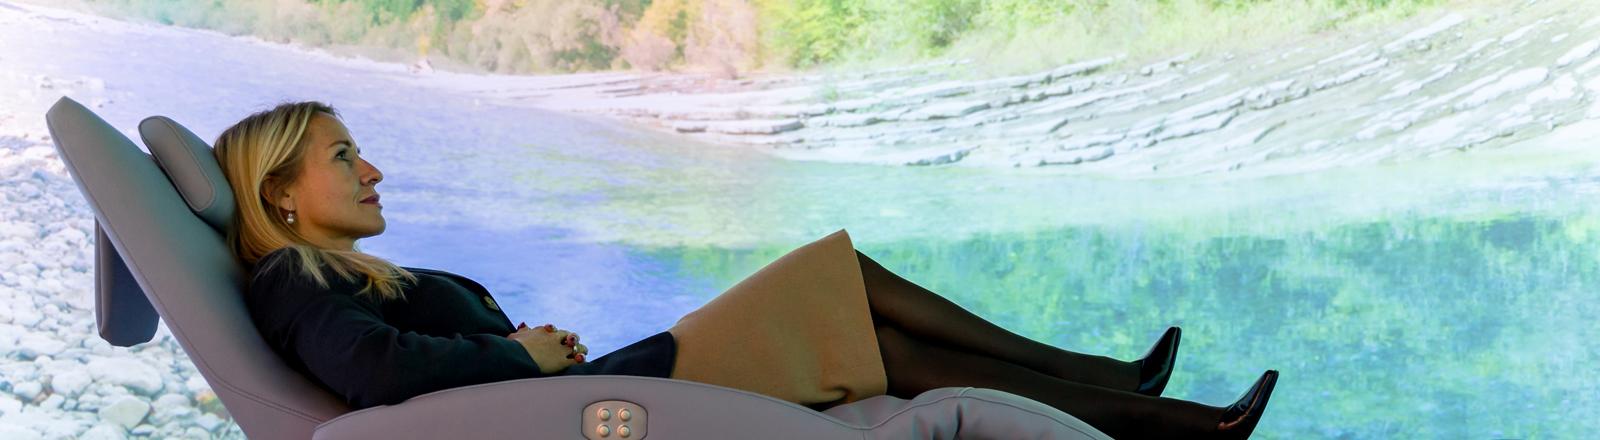 Frau in einem Relax Sessel vor Naturpanorama im Wellnessstudio Anima Mentis in Wien